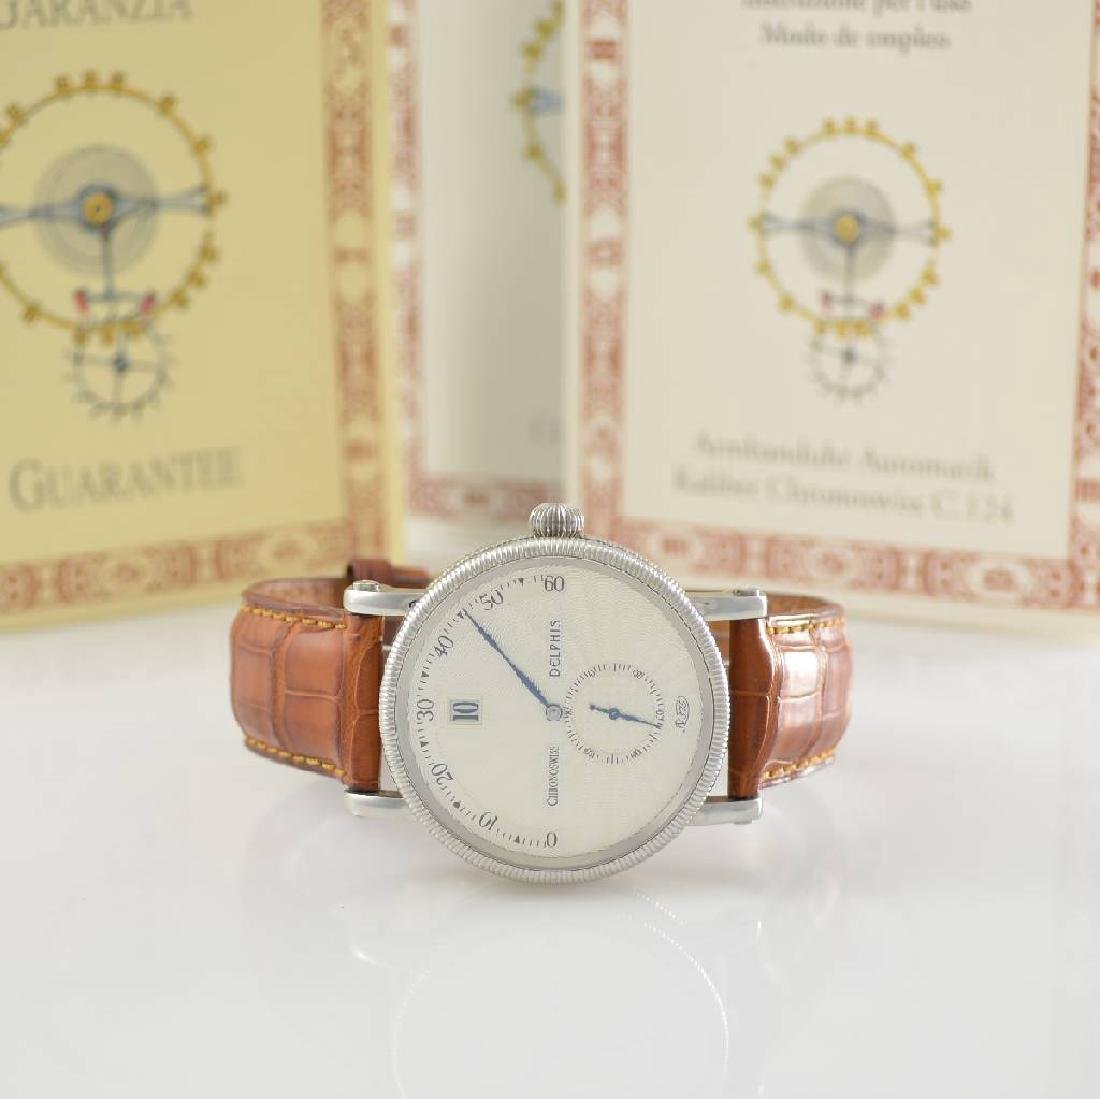 CHRONOSWISS Delphis gents wristwatch in steel